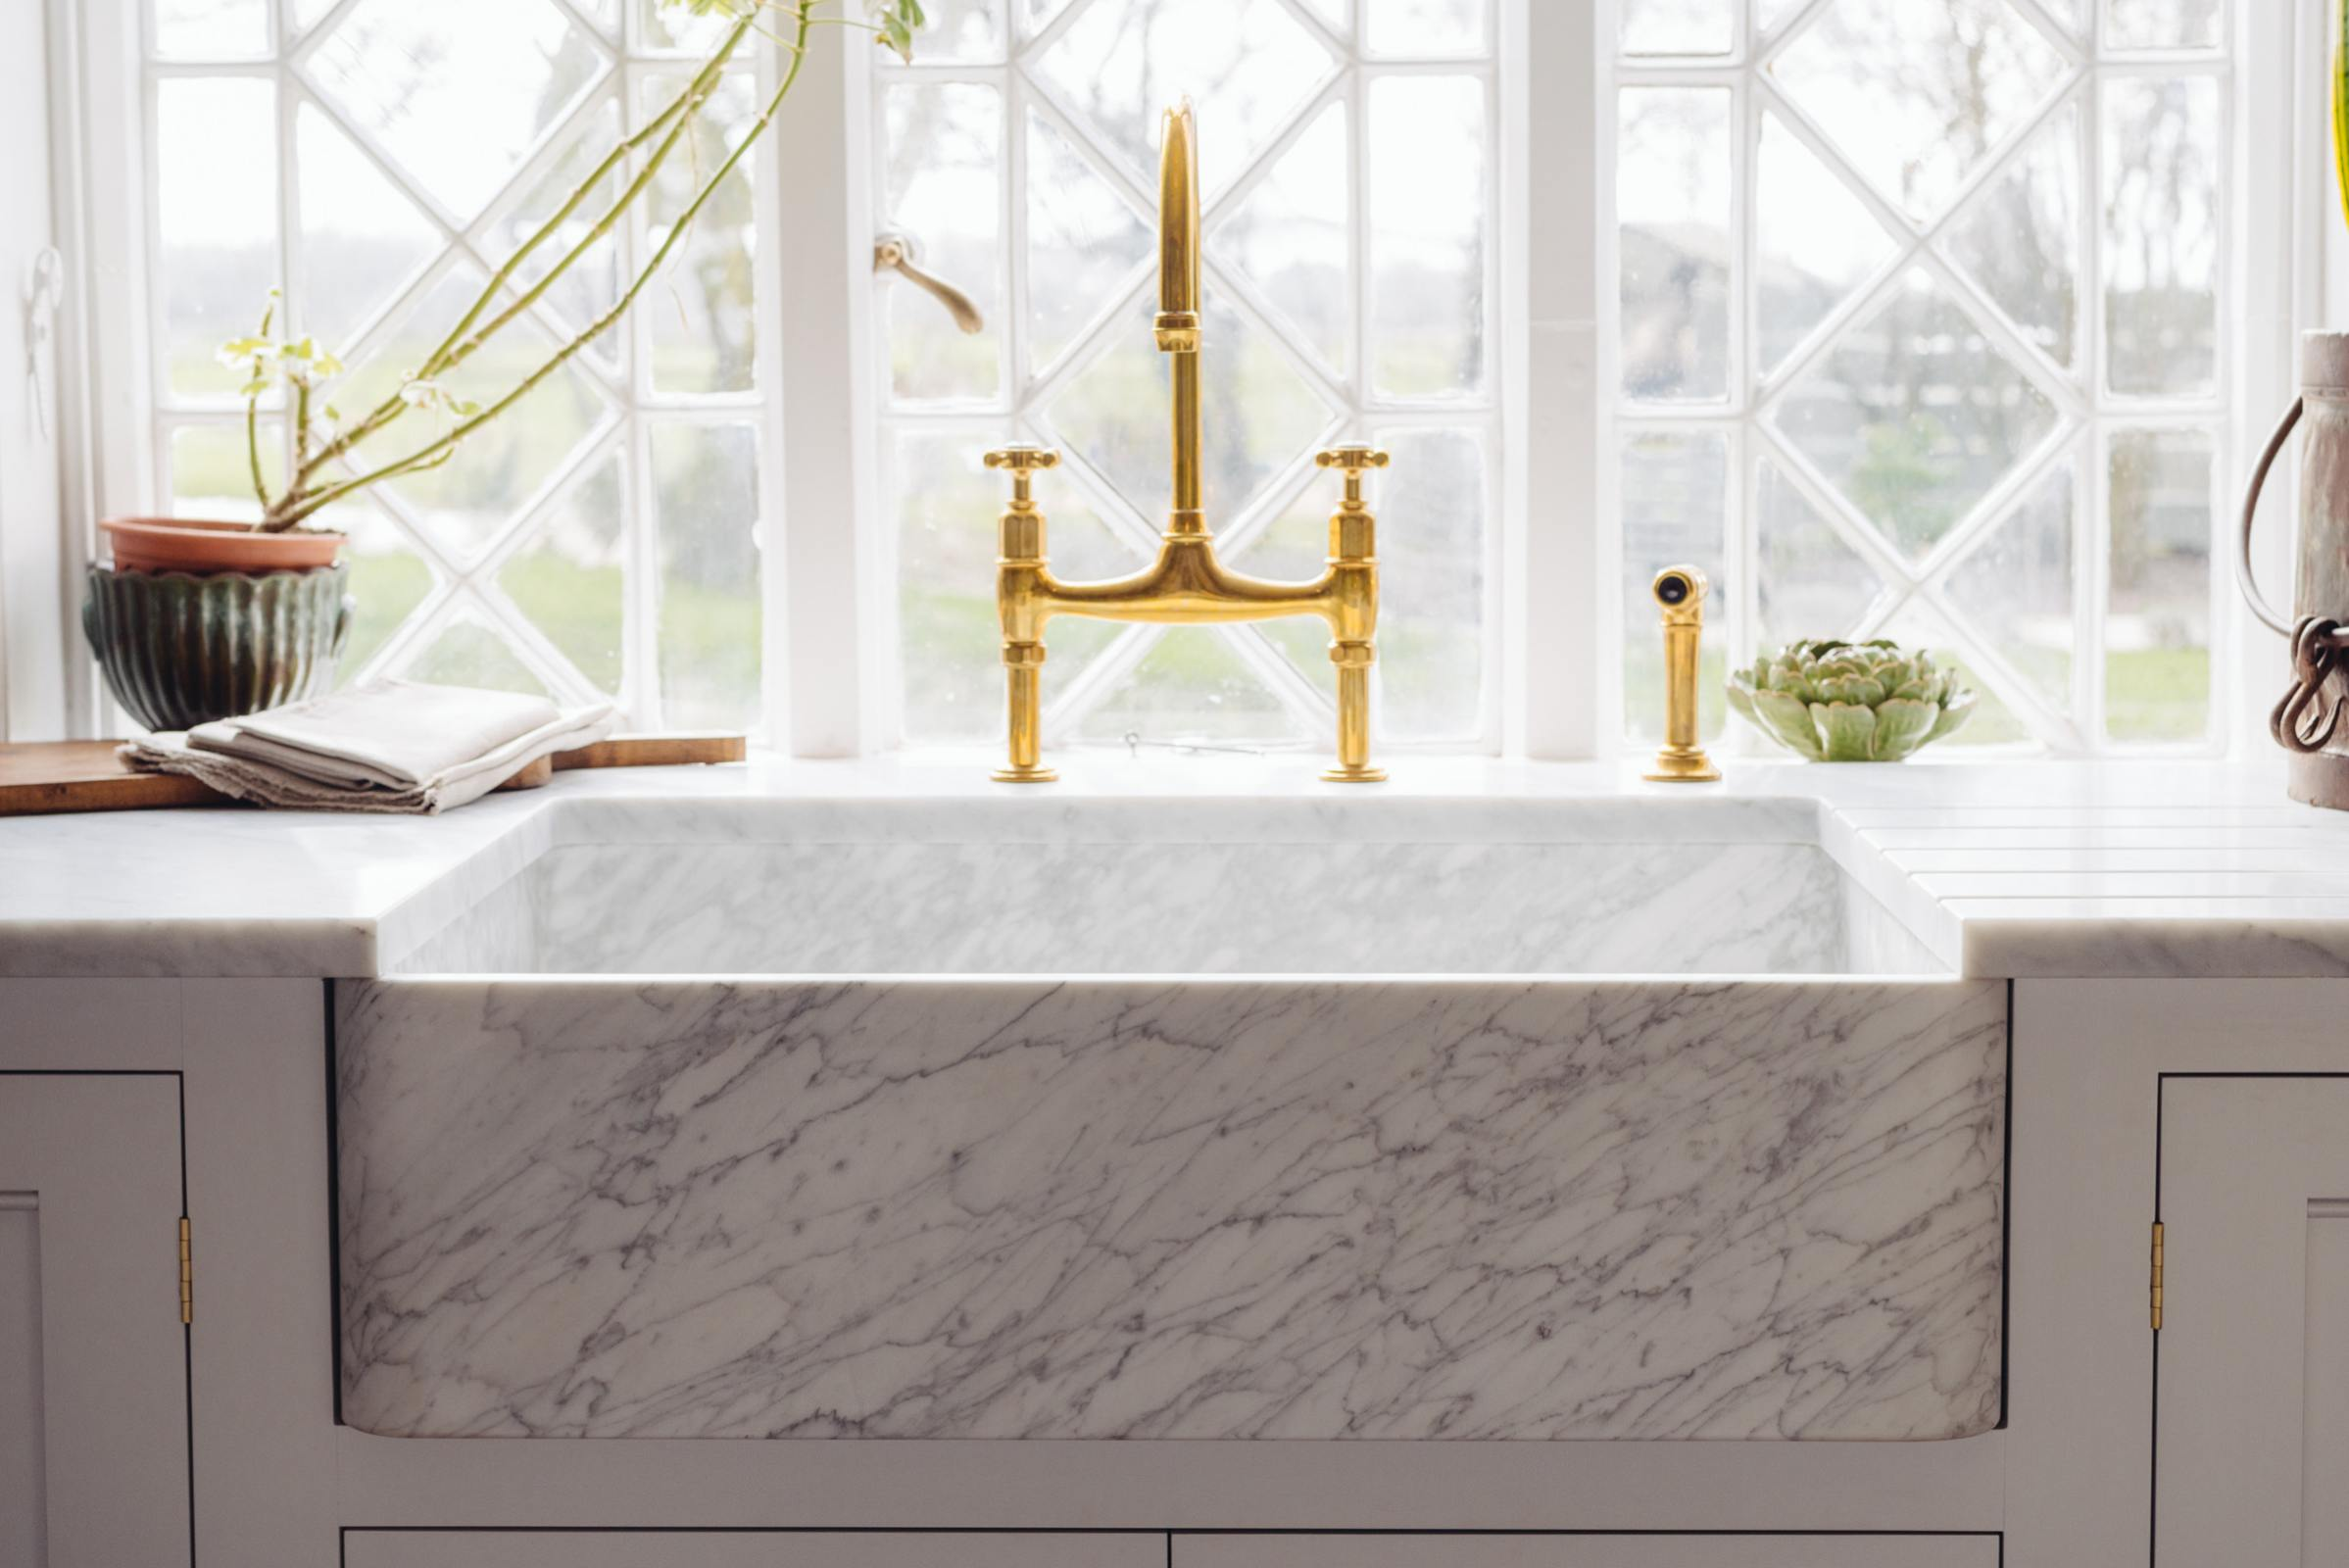 Milano Penthouse 800 Single Marble Sink photo 7